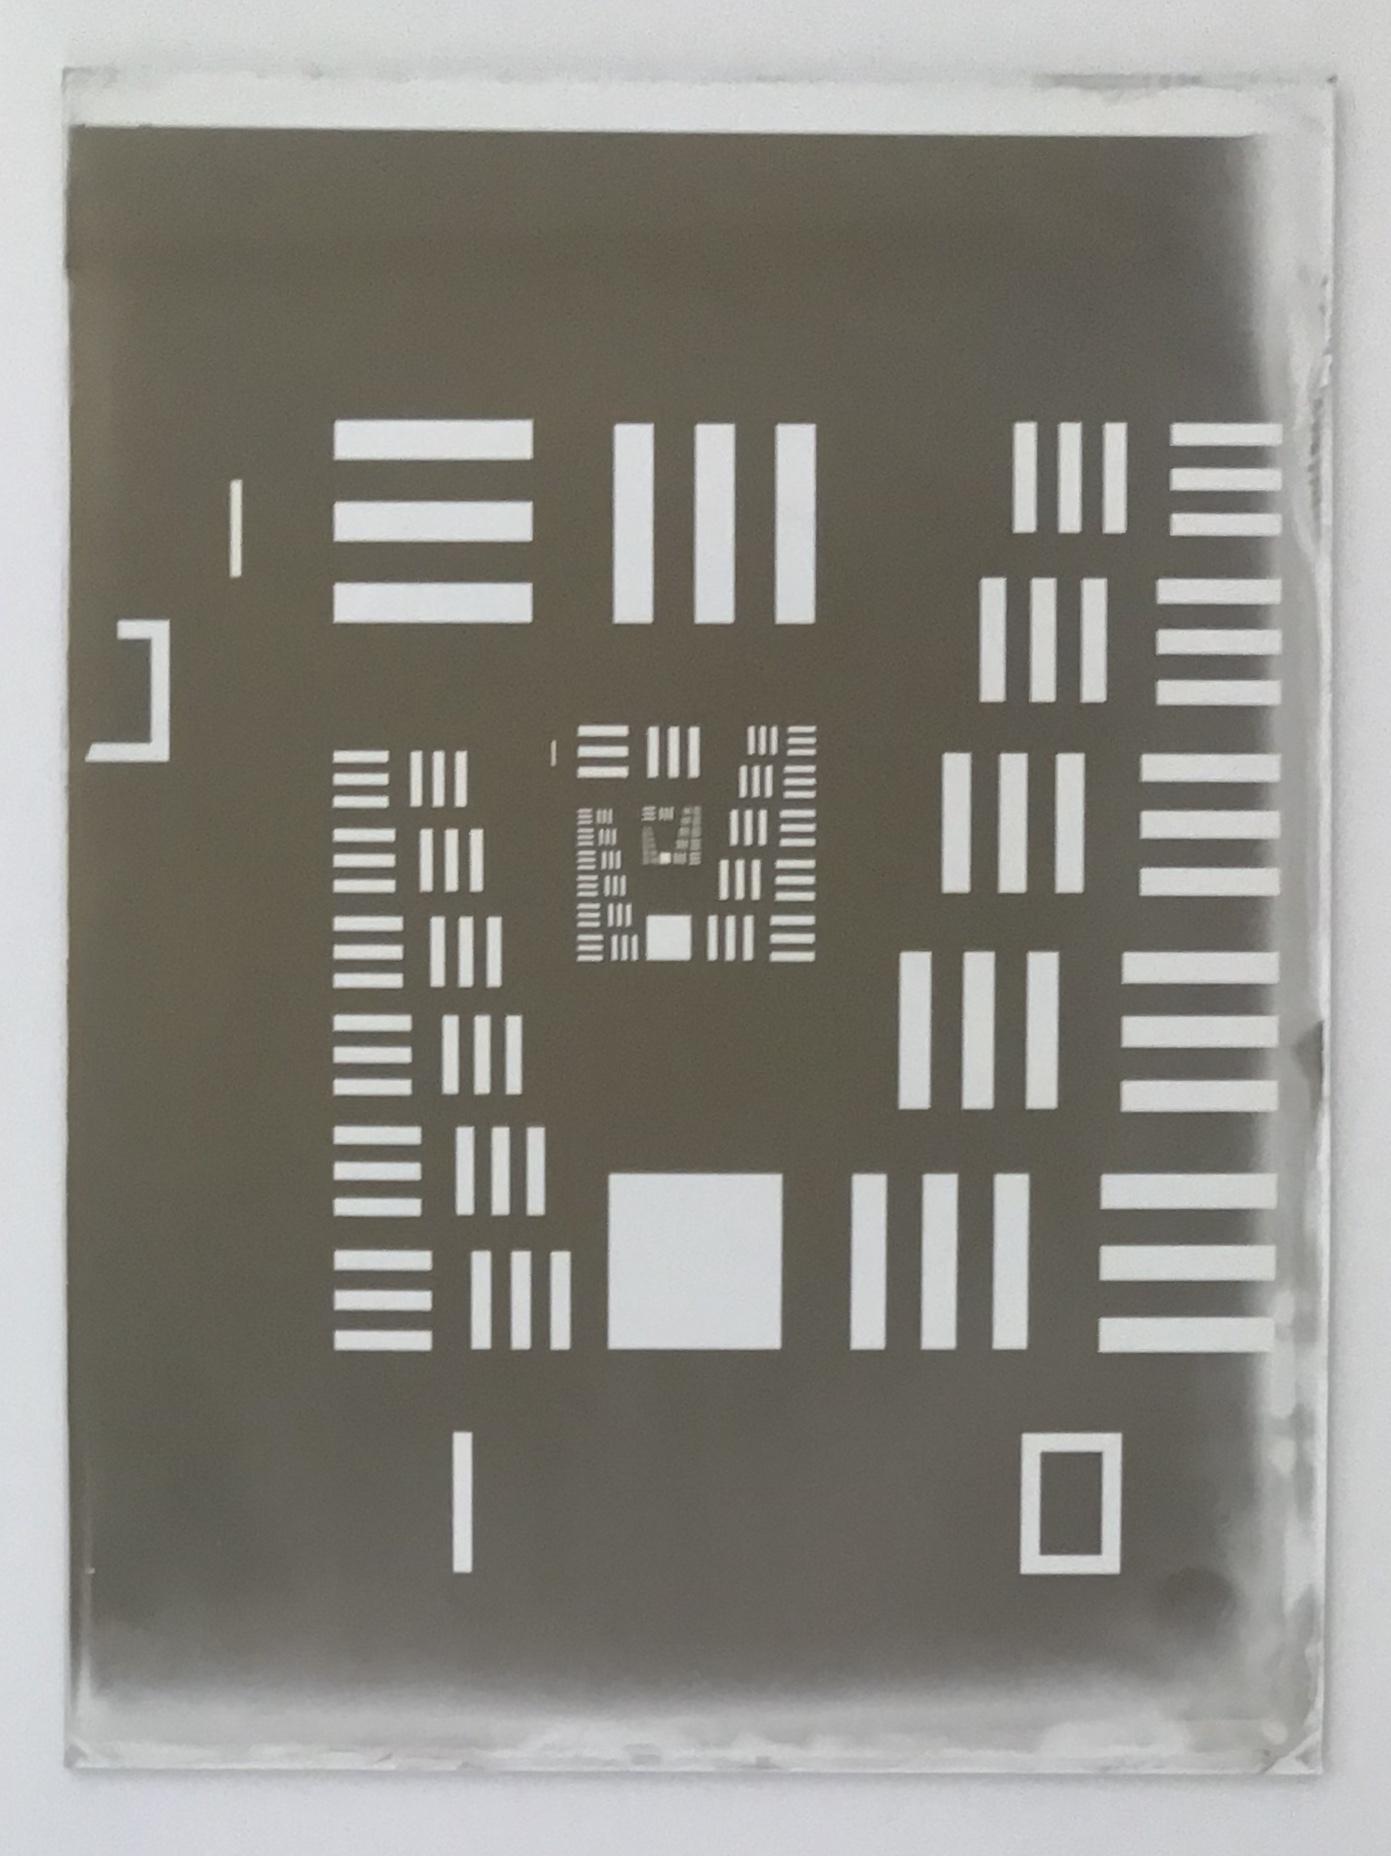 BroombergChanarin - The Black Dog - 2017 - Lense sharpness test on 8_x10_ collodion glass plates.jpg